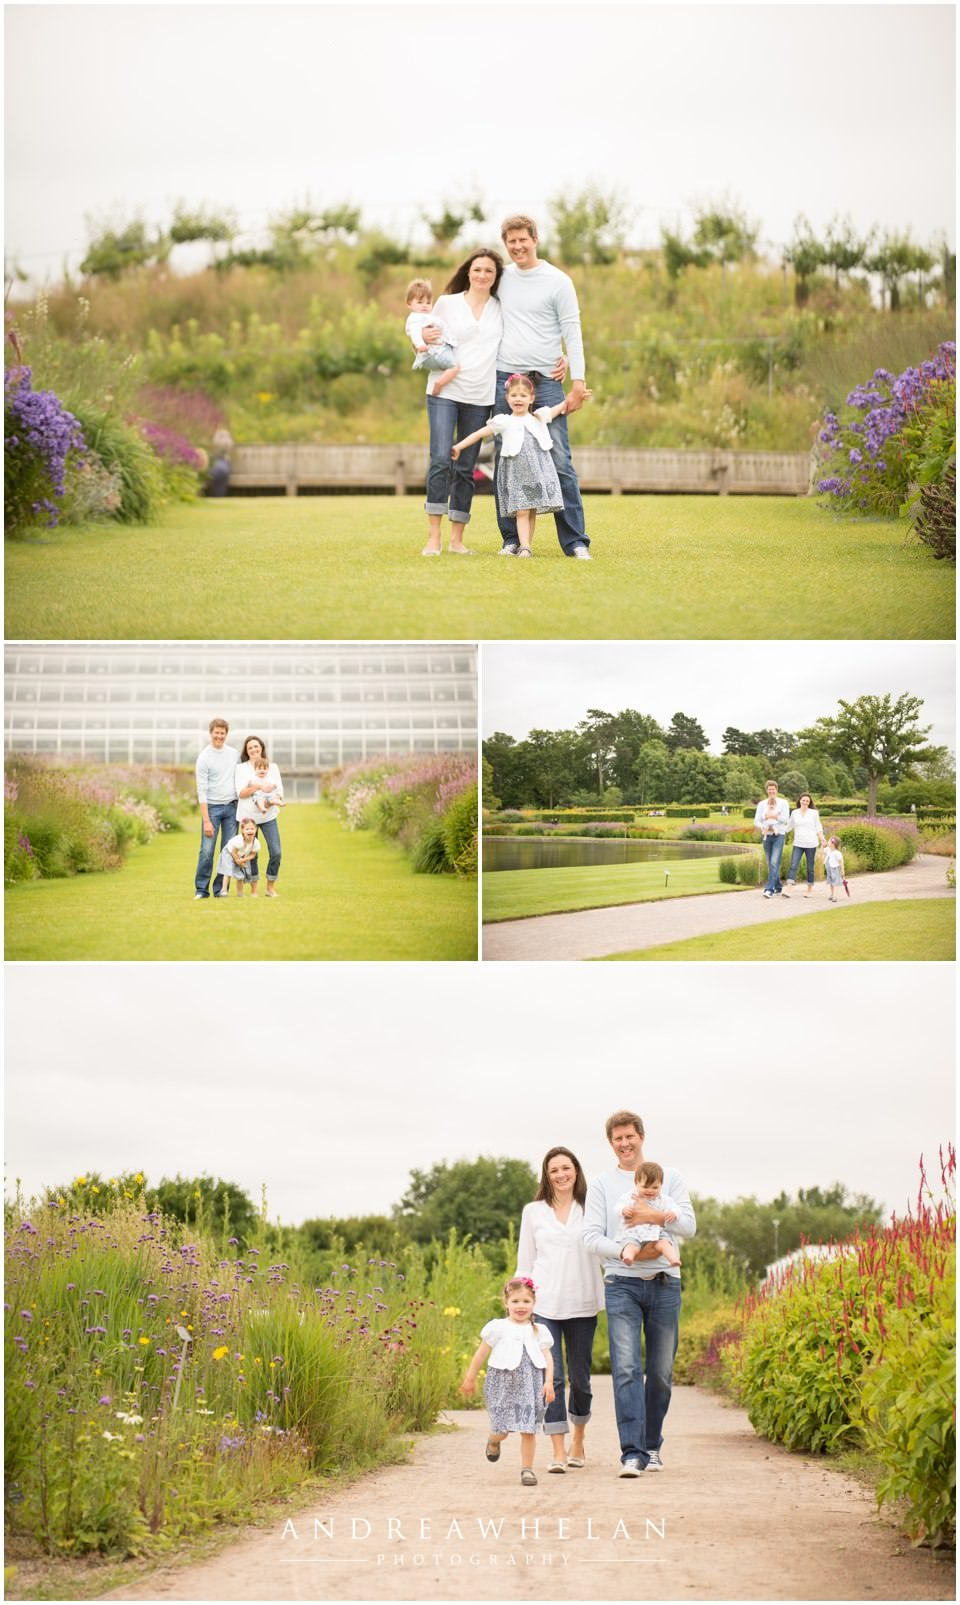 family photo shoot wisely garden surrey photographer